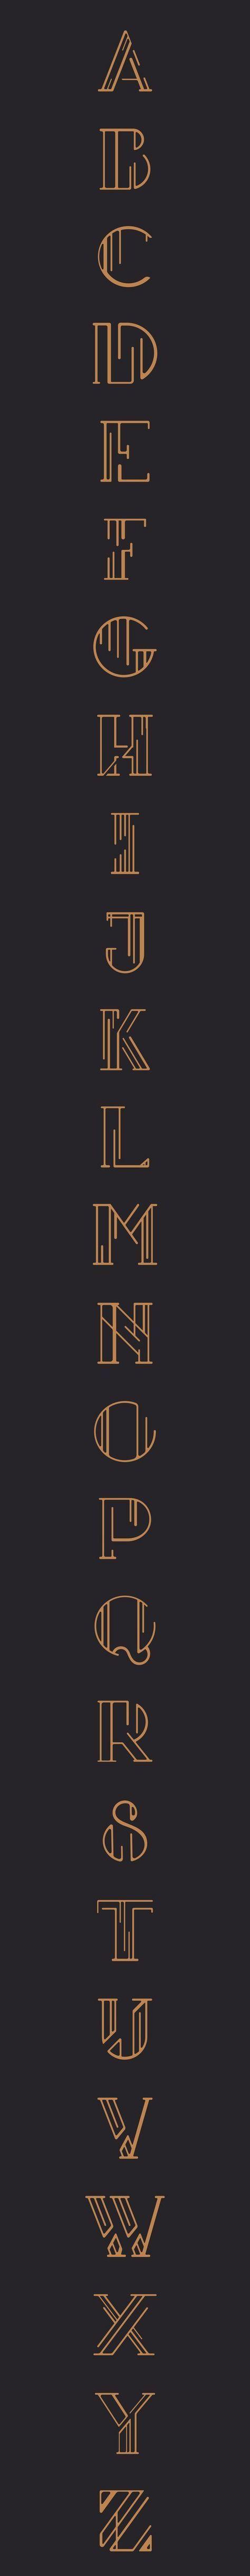 Insomnia Deco | Creative Art Deco style font